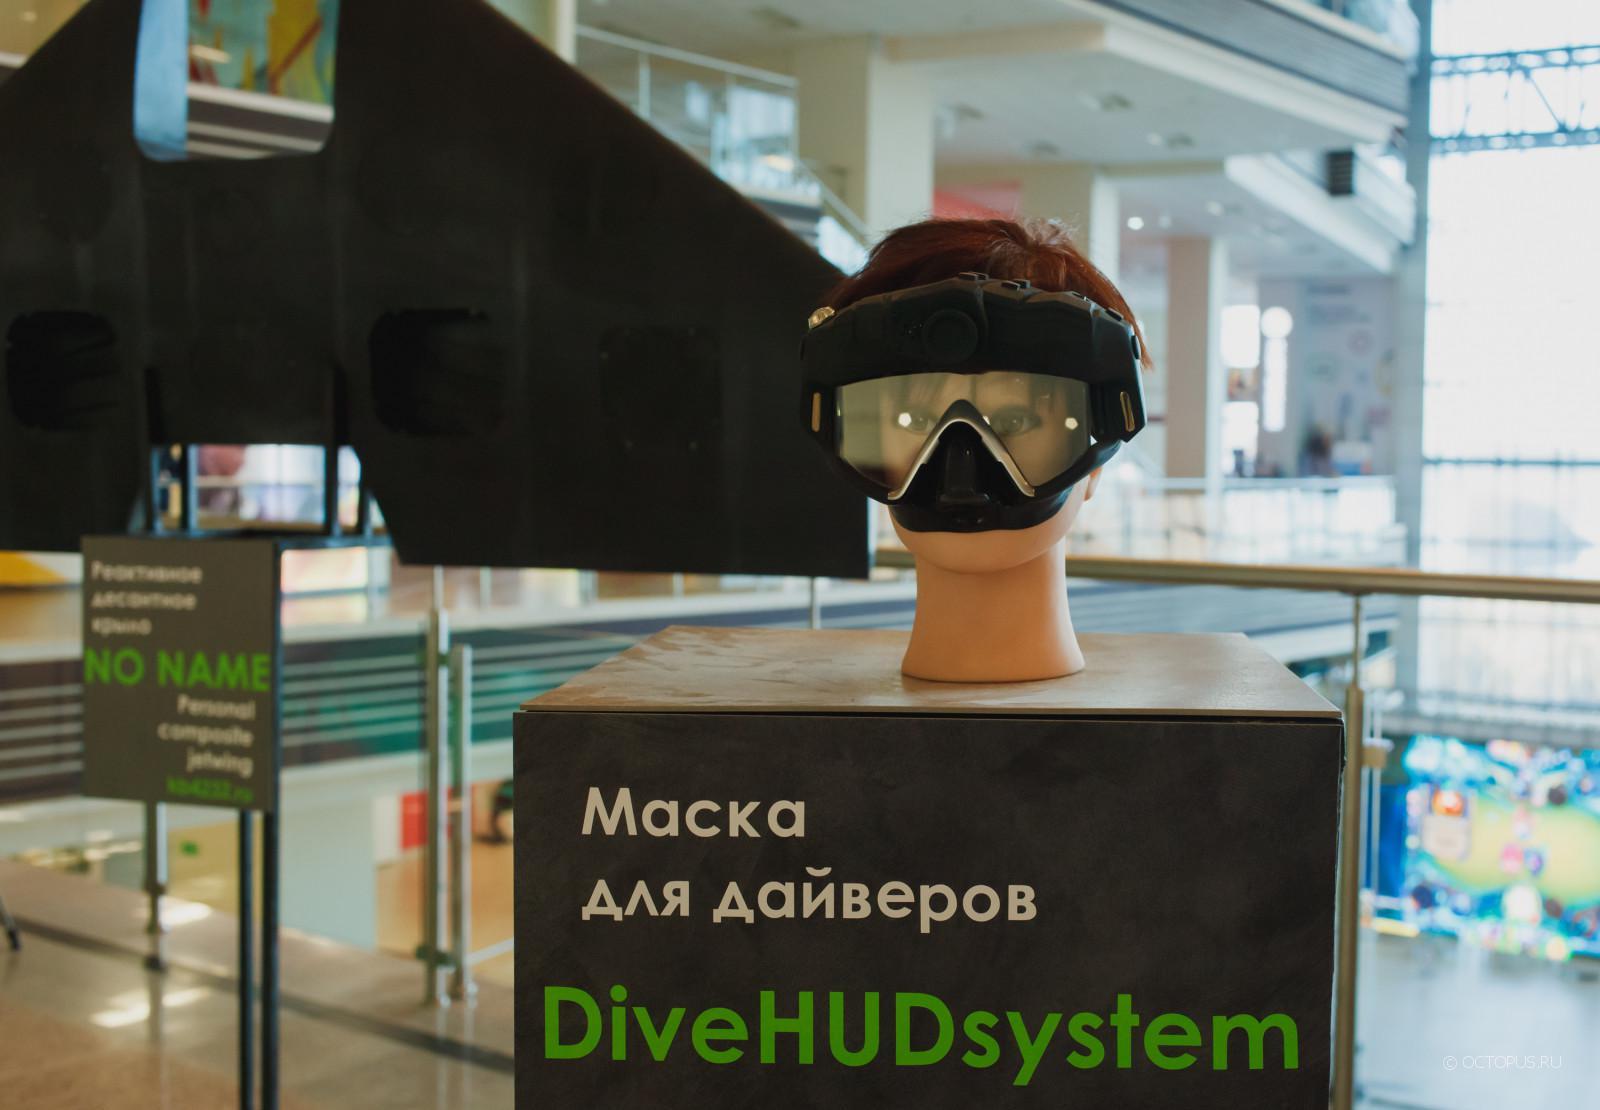 Маска Hud Dive Mask для безопасного дайвинга